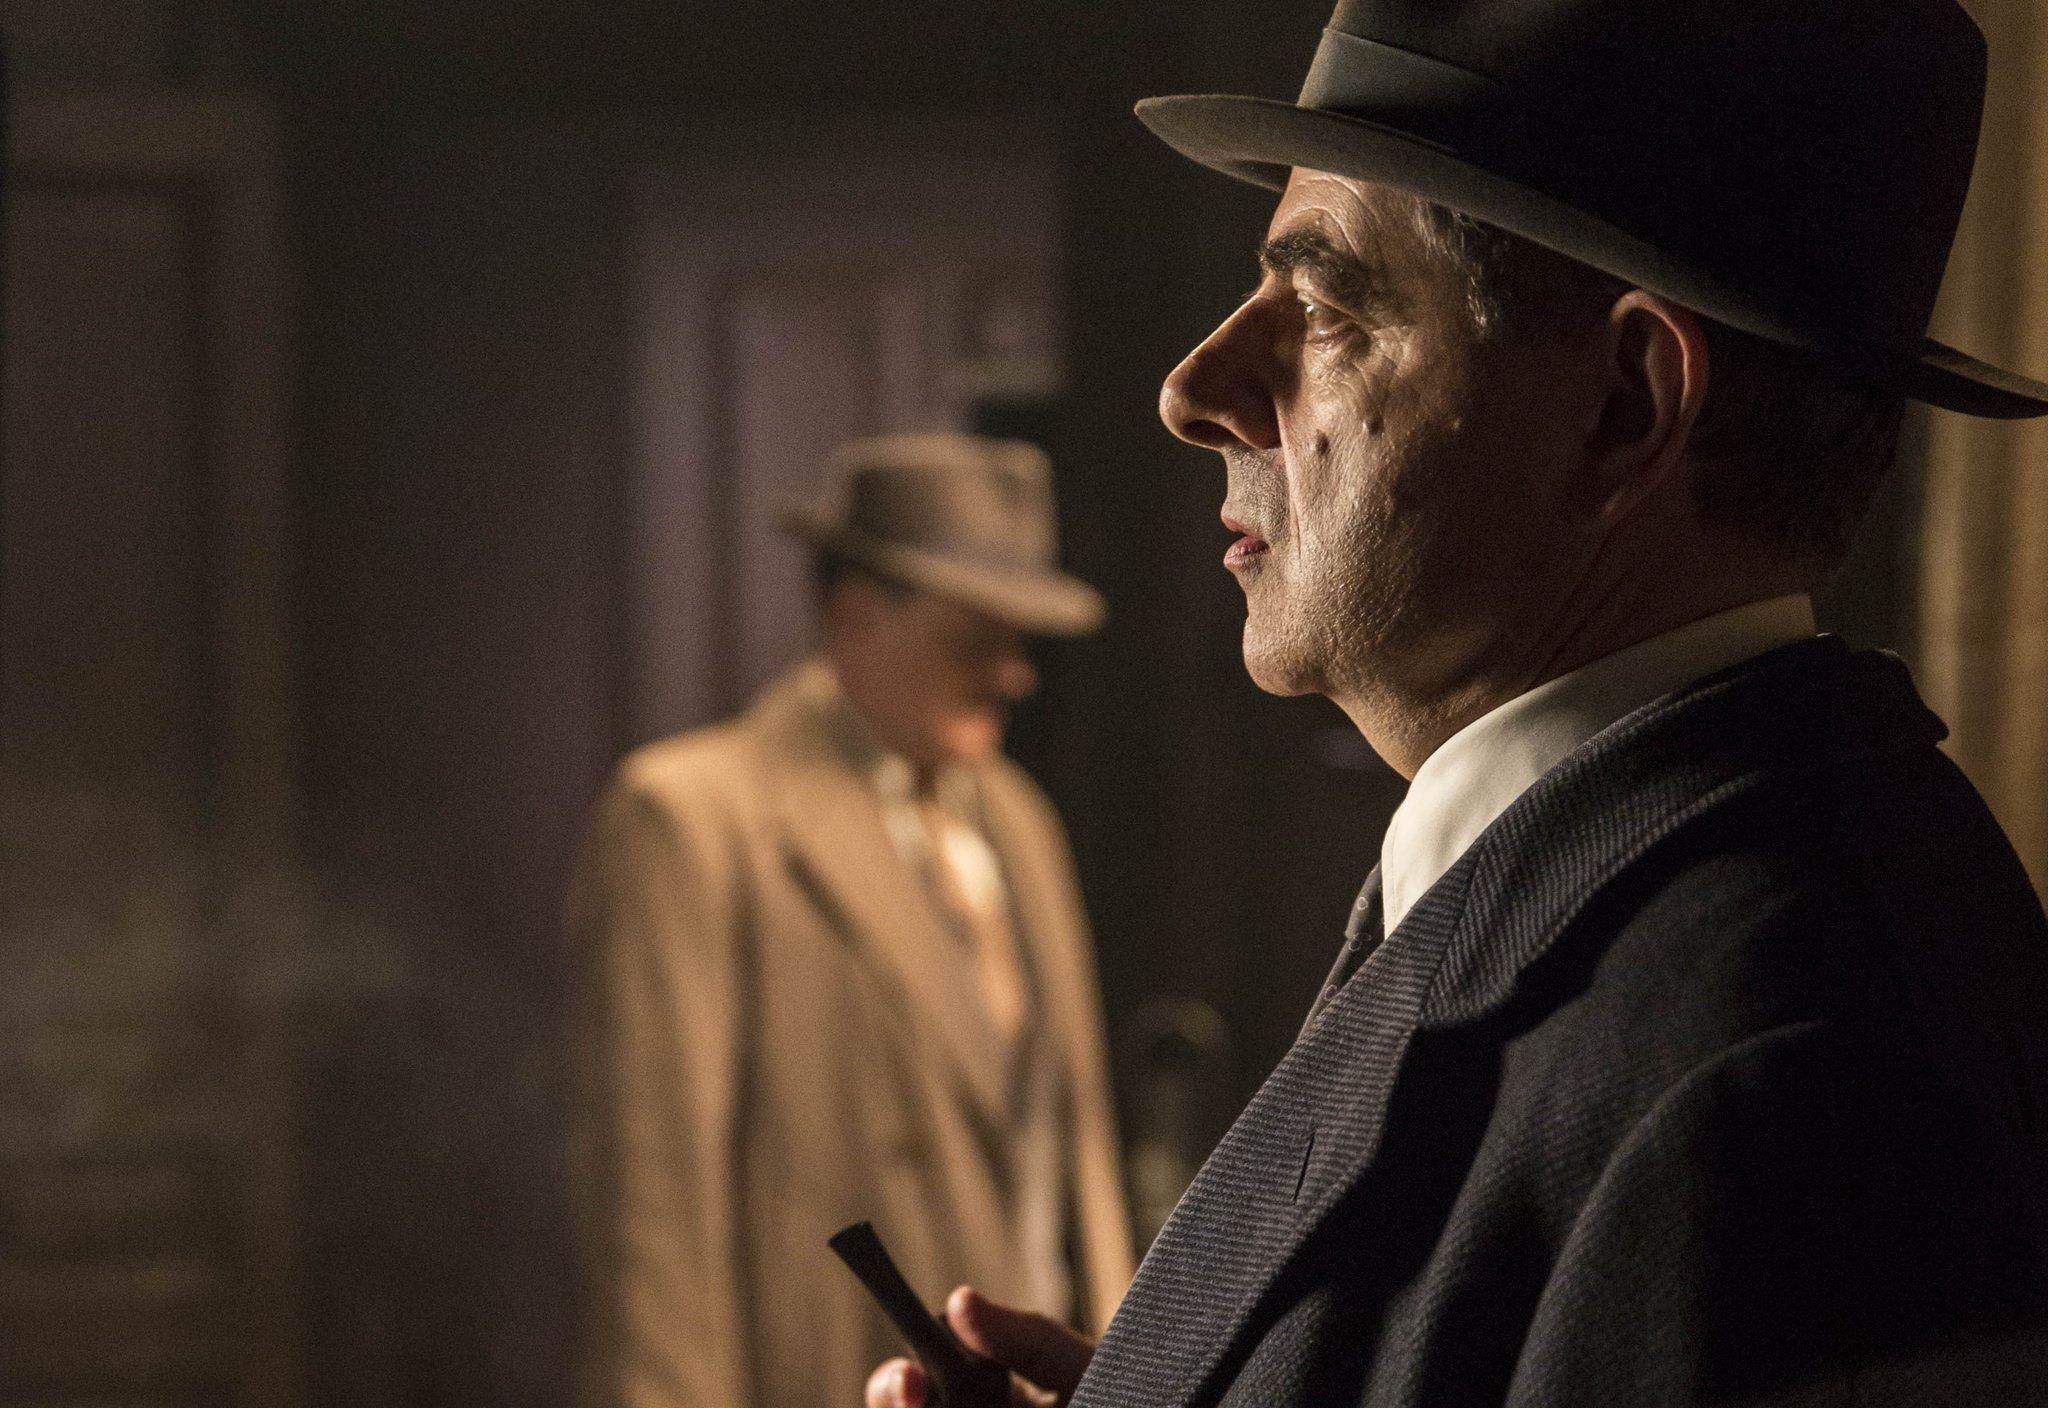 Rowan Atkinson in Maigret's Dead Man © ITV plc